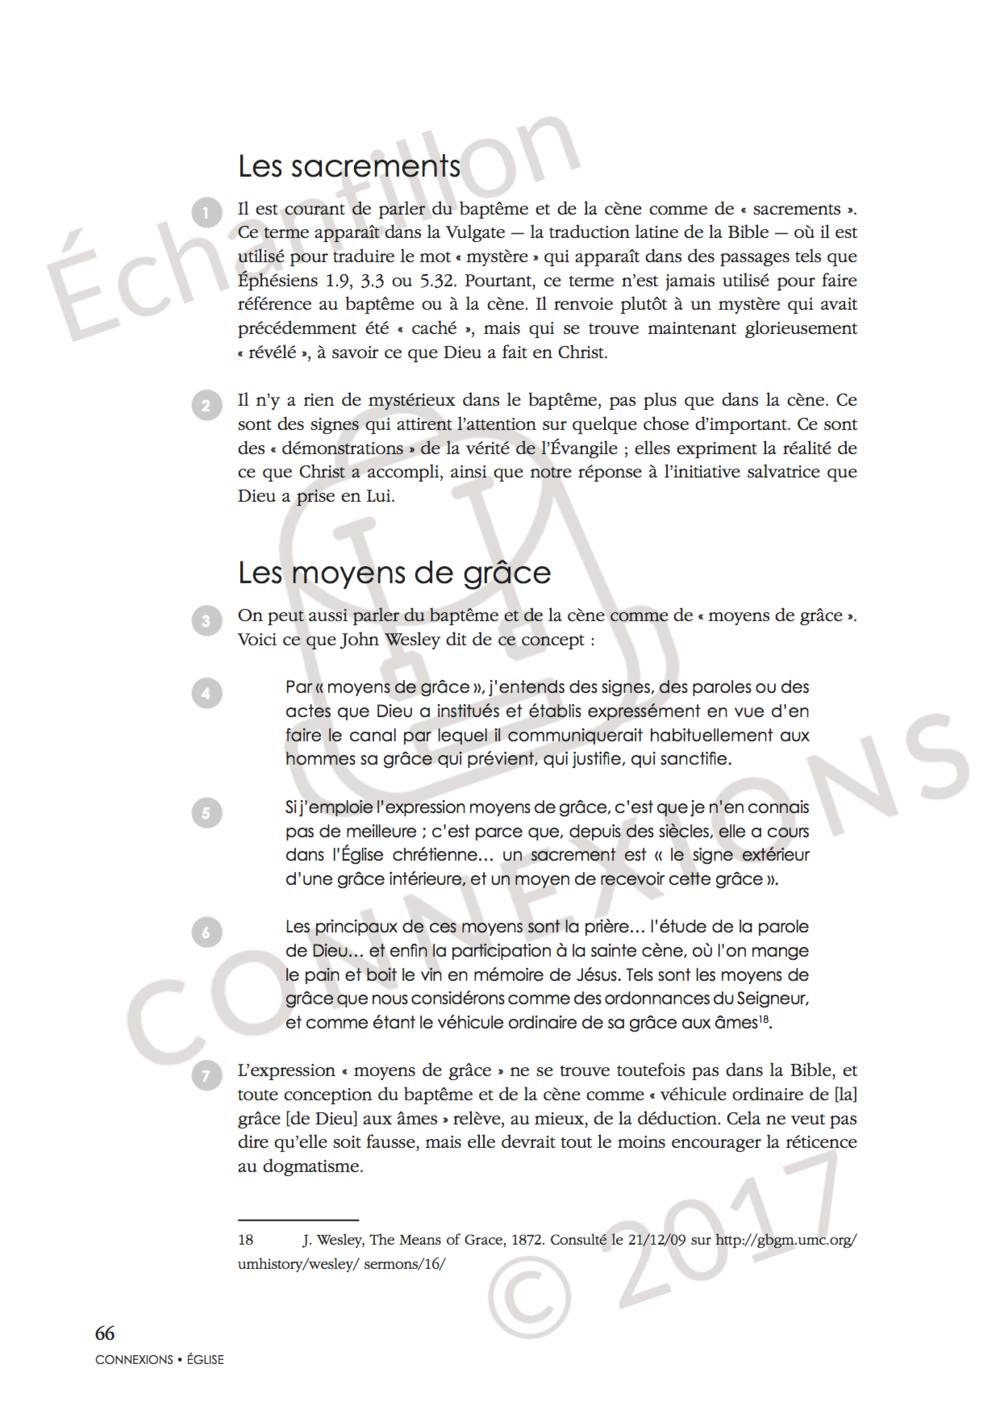 Garder le cap missionnel_sample_published.3.png